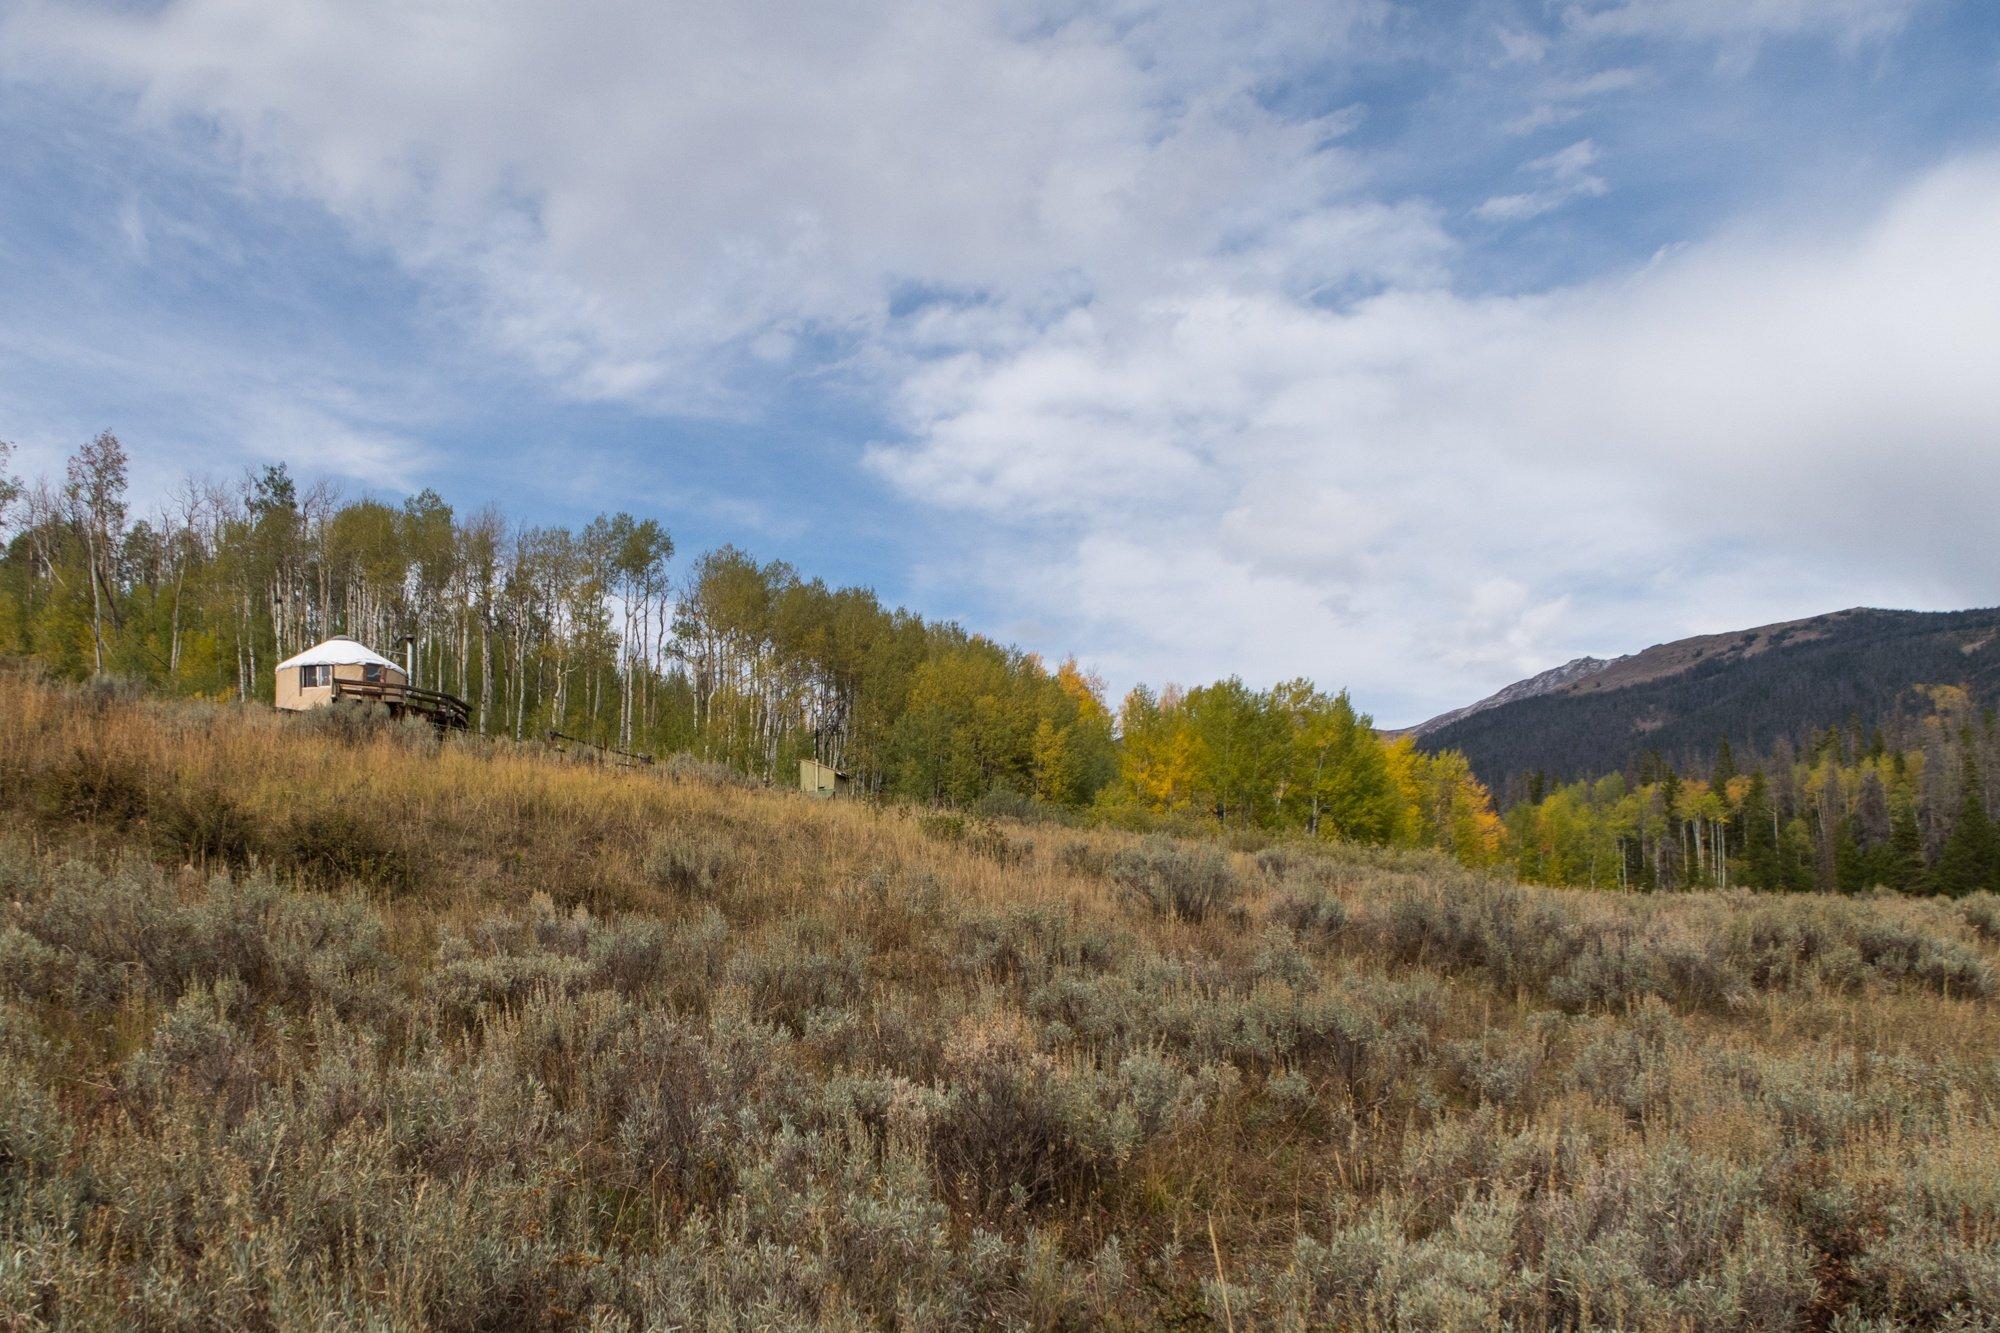 North Fork Canadian Yurt